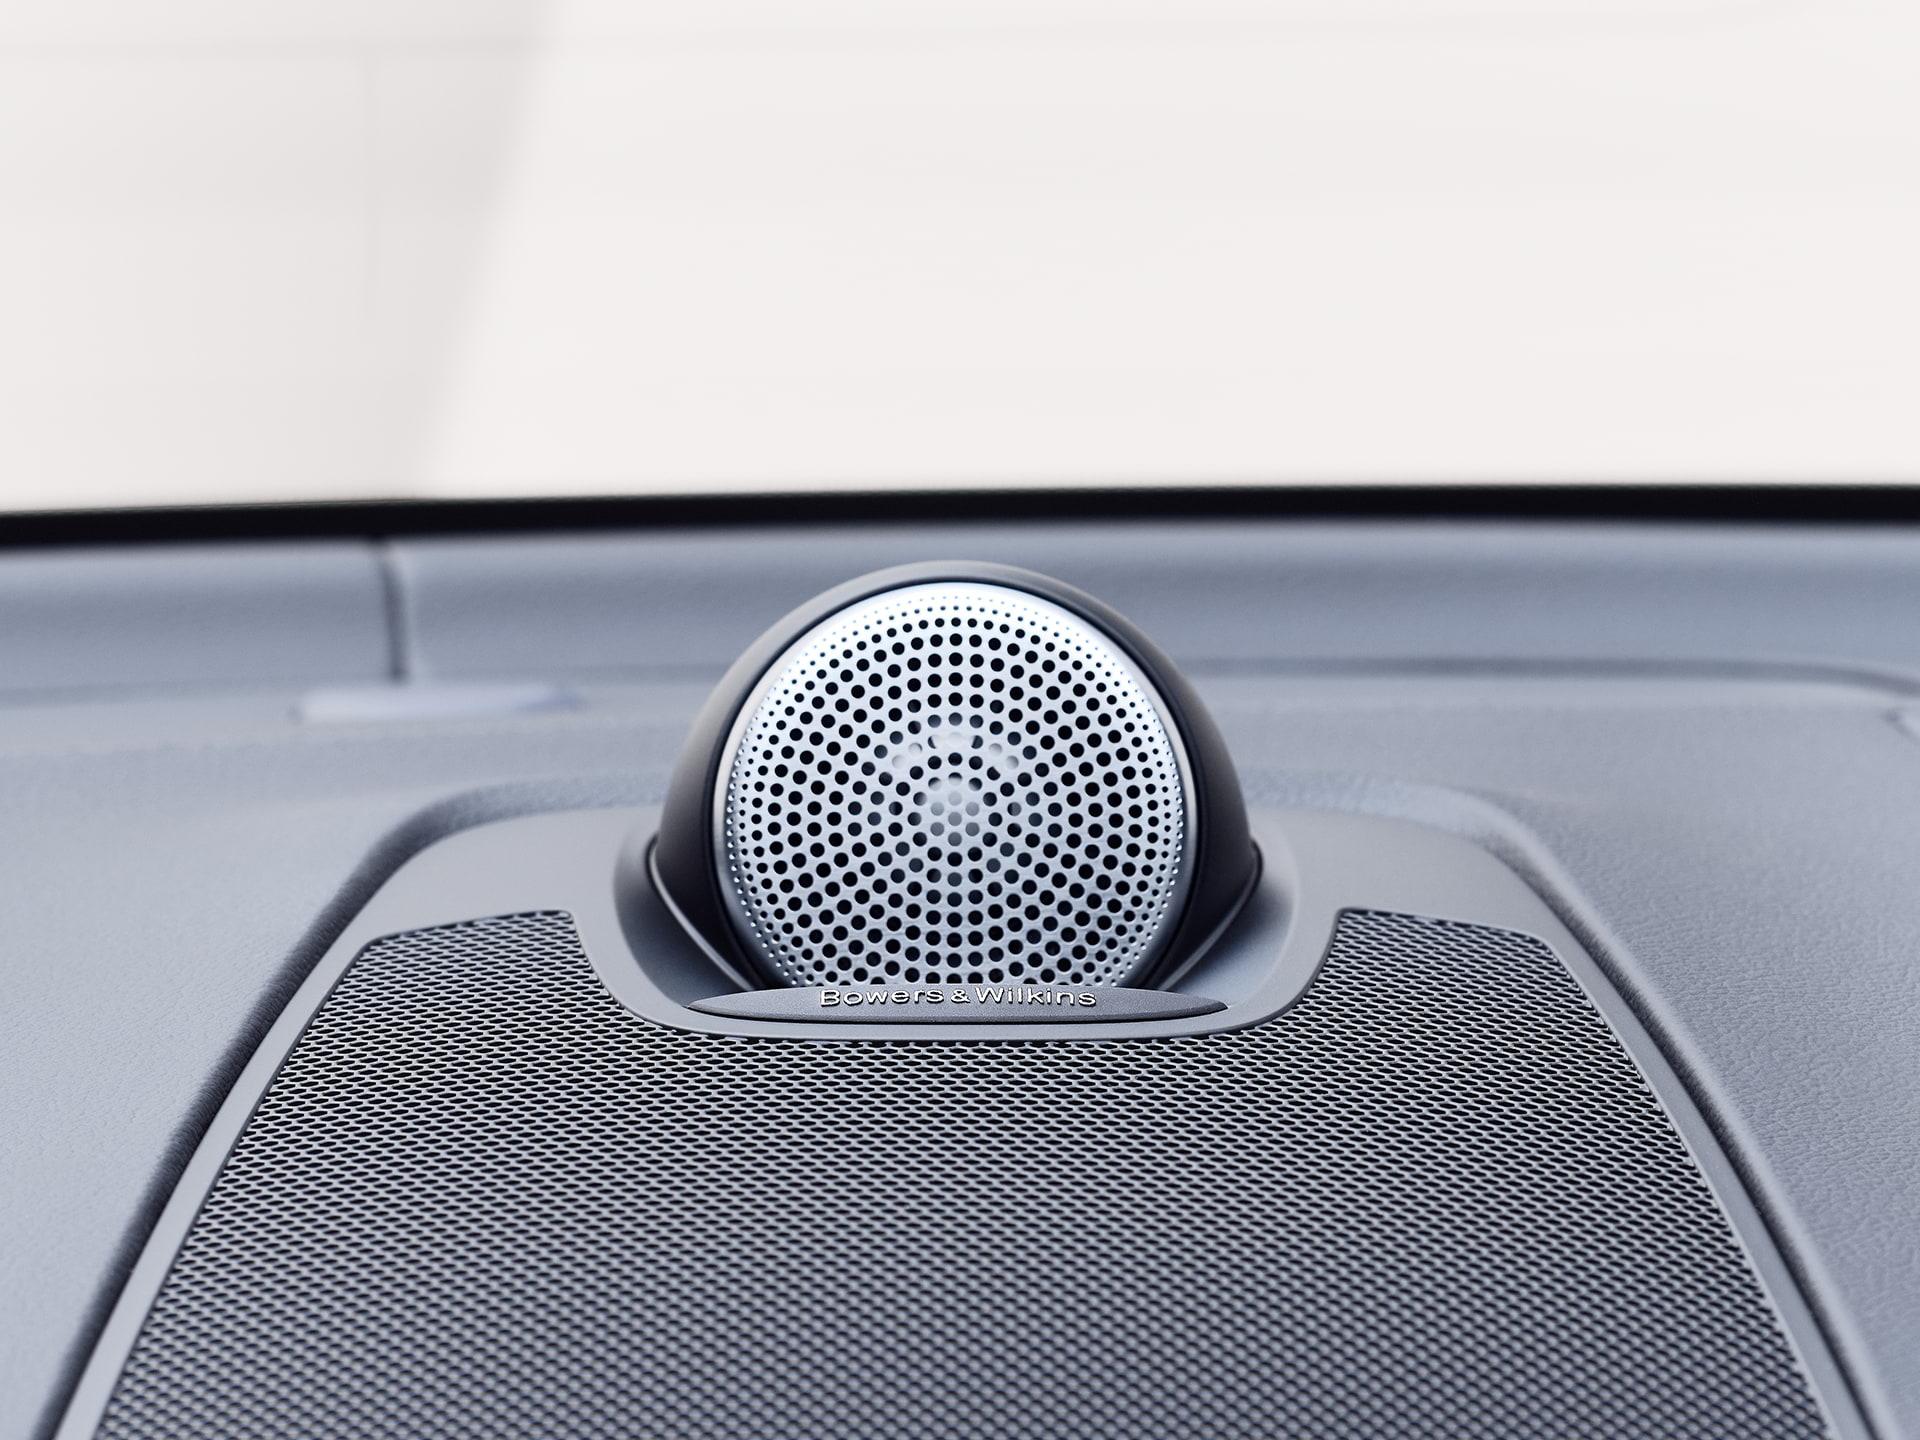 Bowers & Wilkins speakers inside a Volvo XC60.